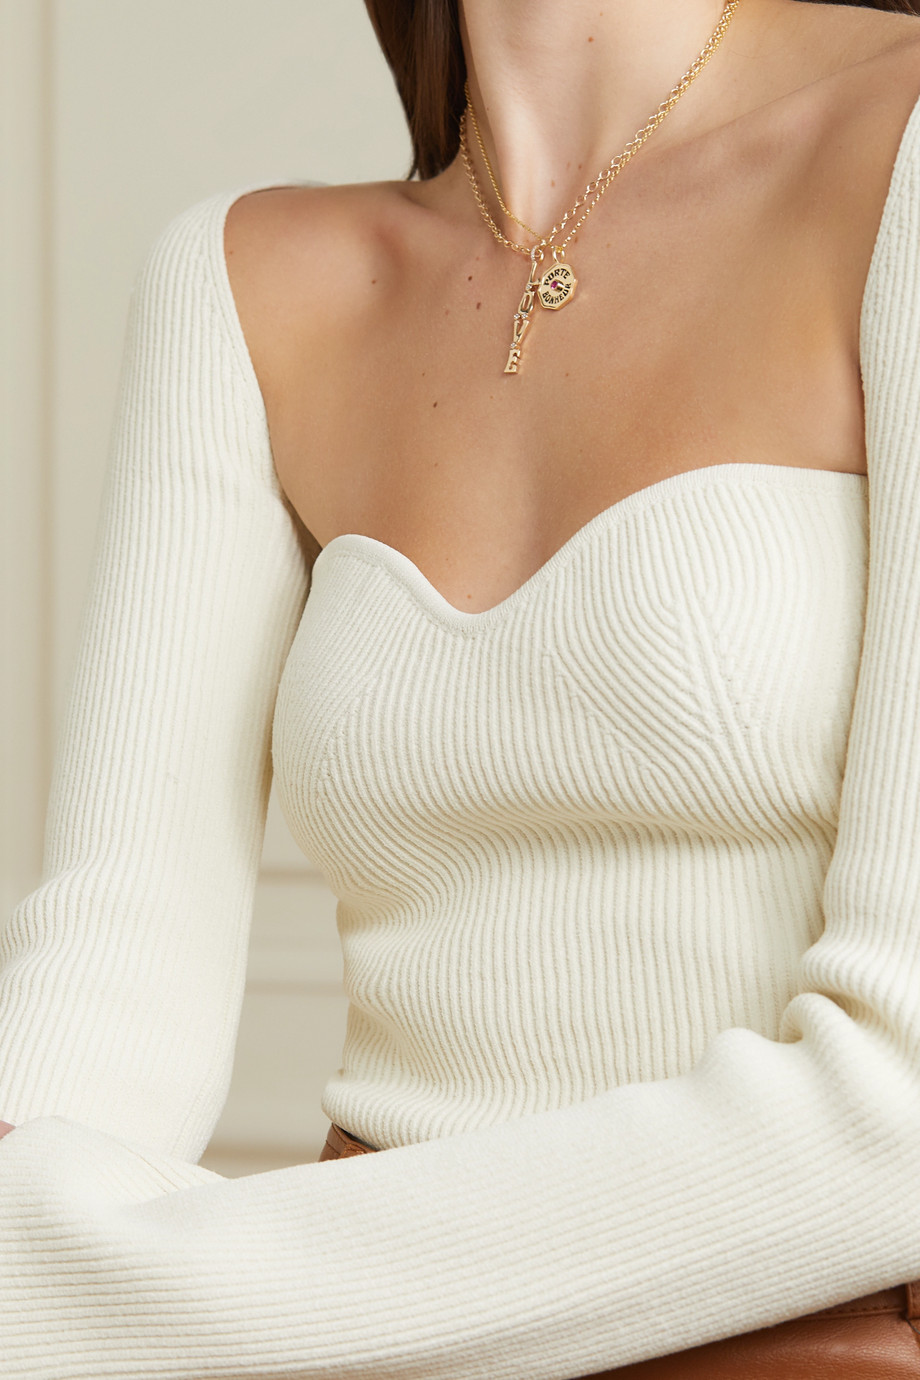 Marlo Laz Mini Porte Bonheur Coin 14-karat gold, enamel and sapphire necklace